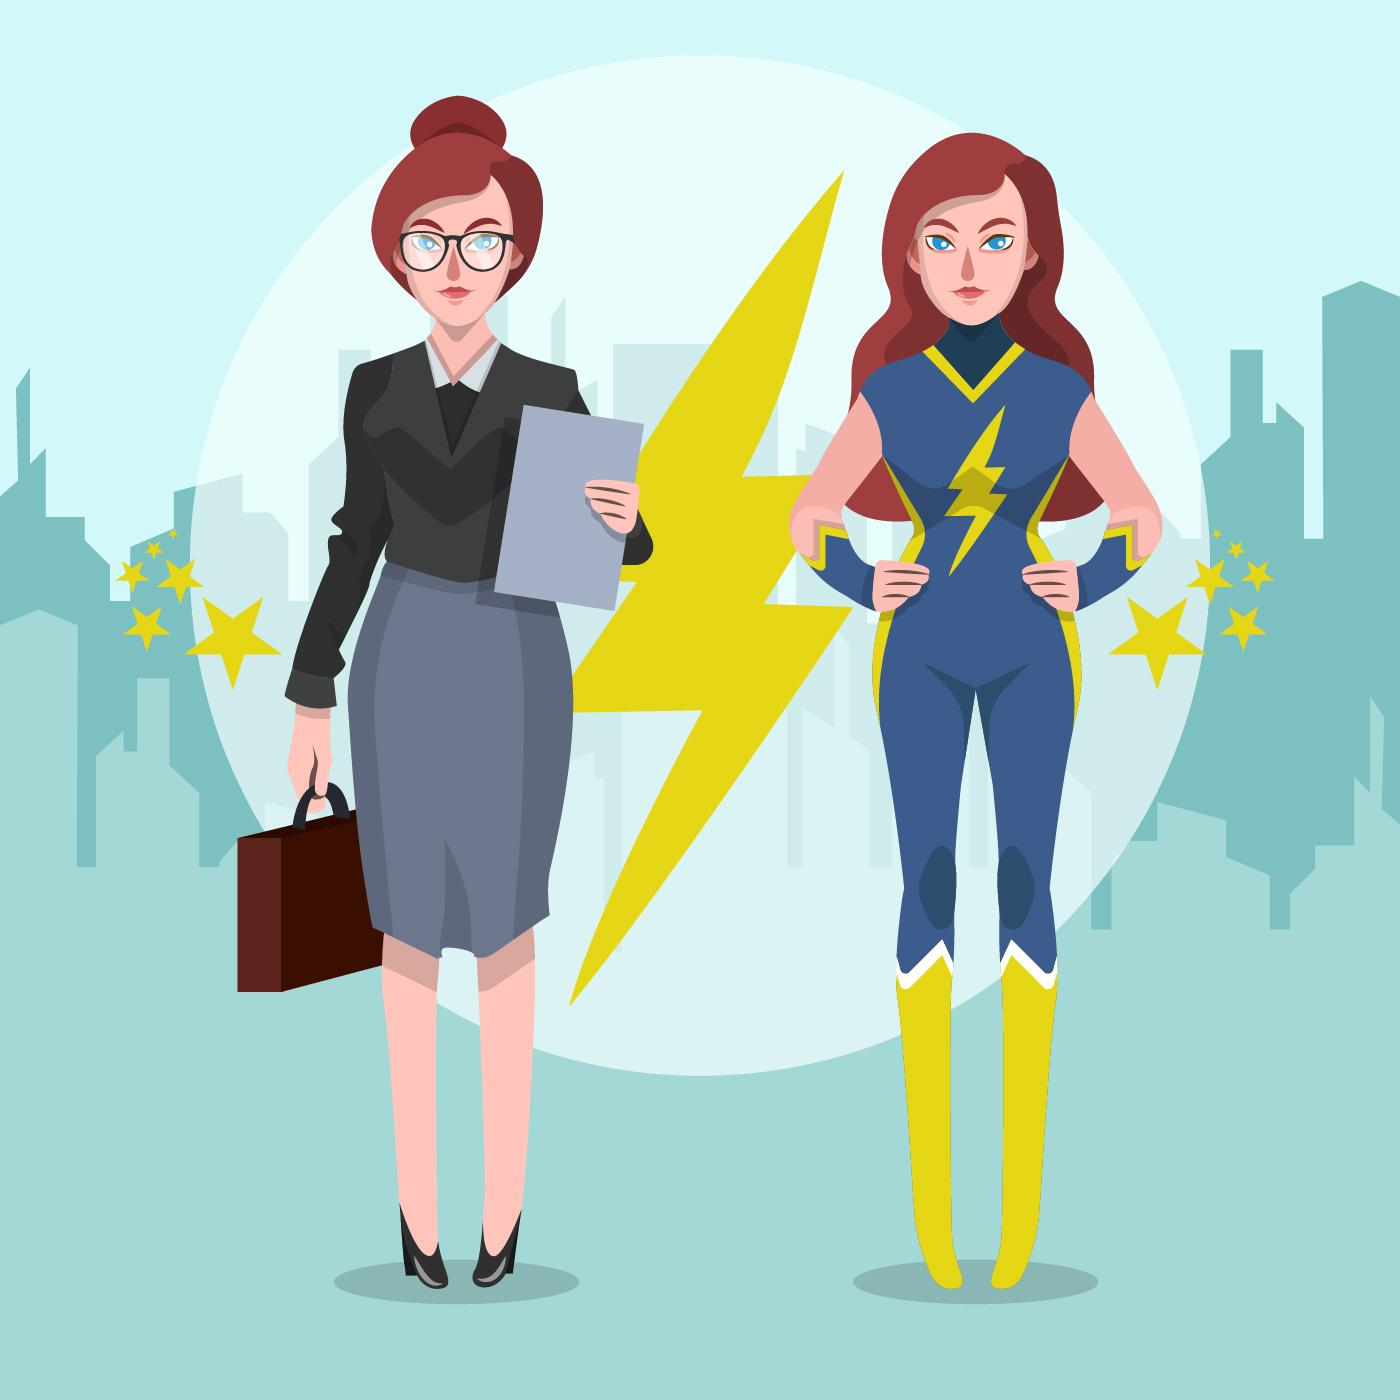 Supergirl original for SP3 by Terrymcg on DeviantArt   Original Superwoman